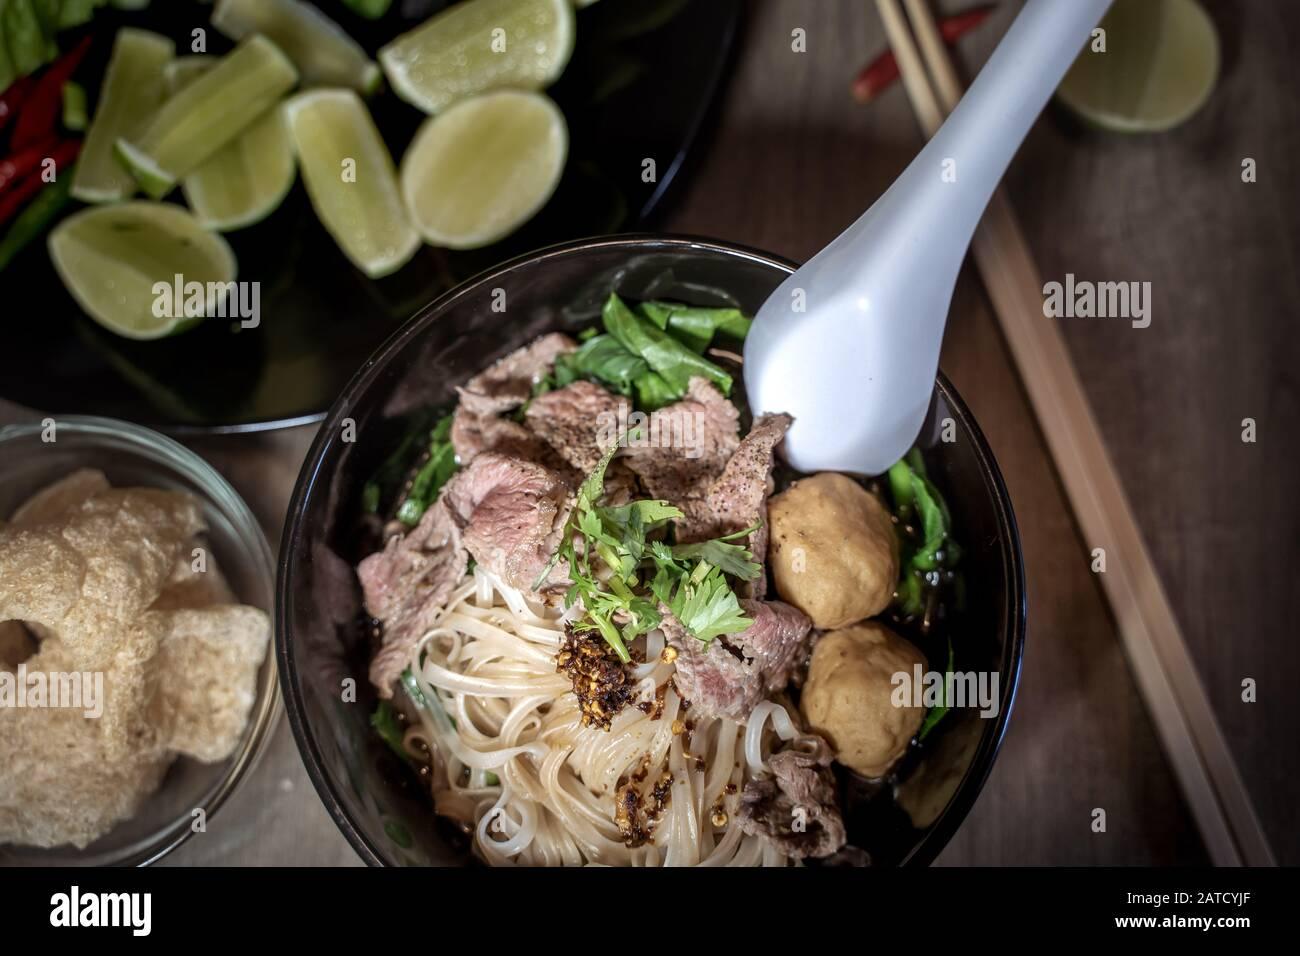 Thai Style Noodle Blood Soup Boat Noodle Delicious Dish Famous Thai Noodle Soup Thai Peoples Call Boat Noodles Close Up Or Selective Focus Stock Photo Alamy,How Long Do Bettas Live In Fish Bowls